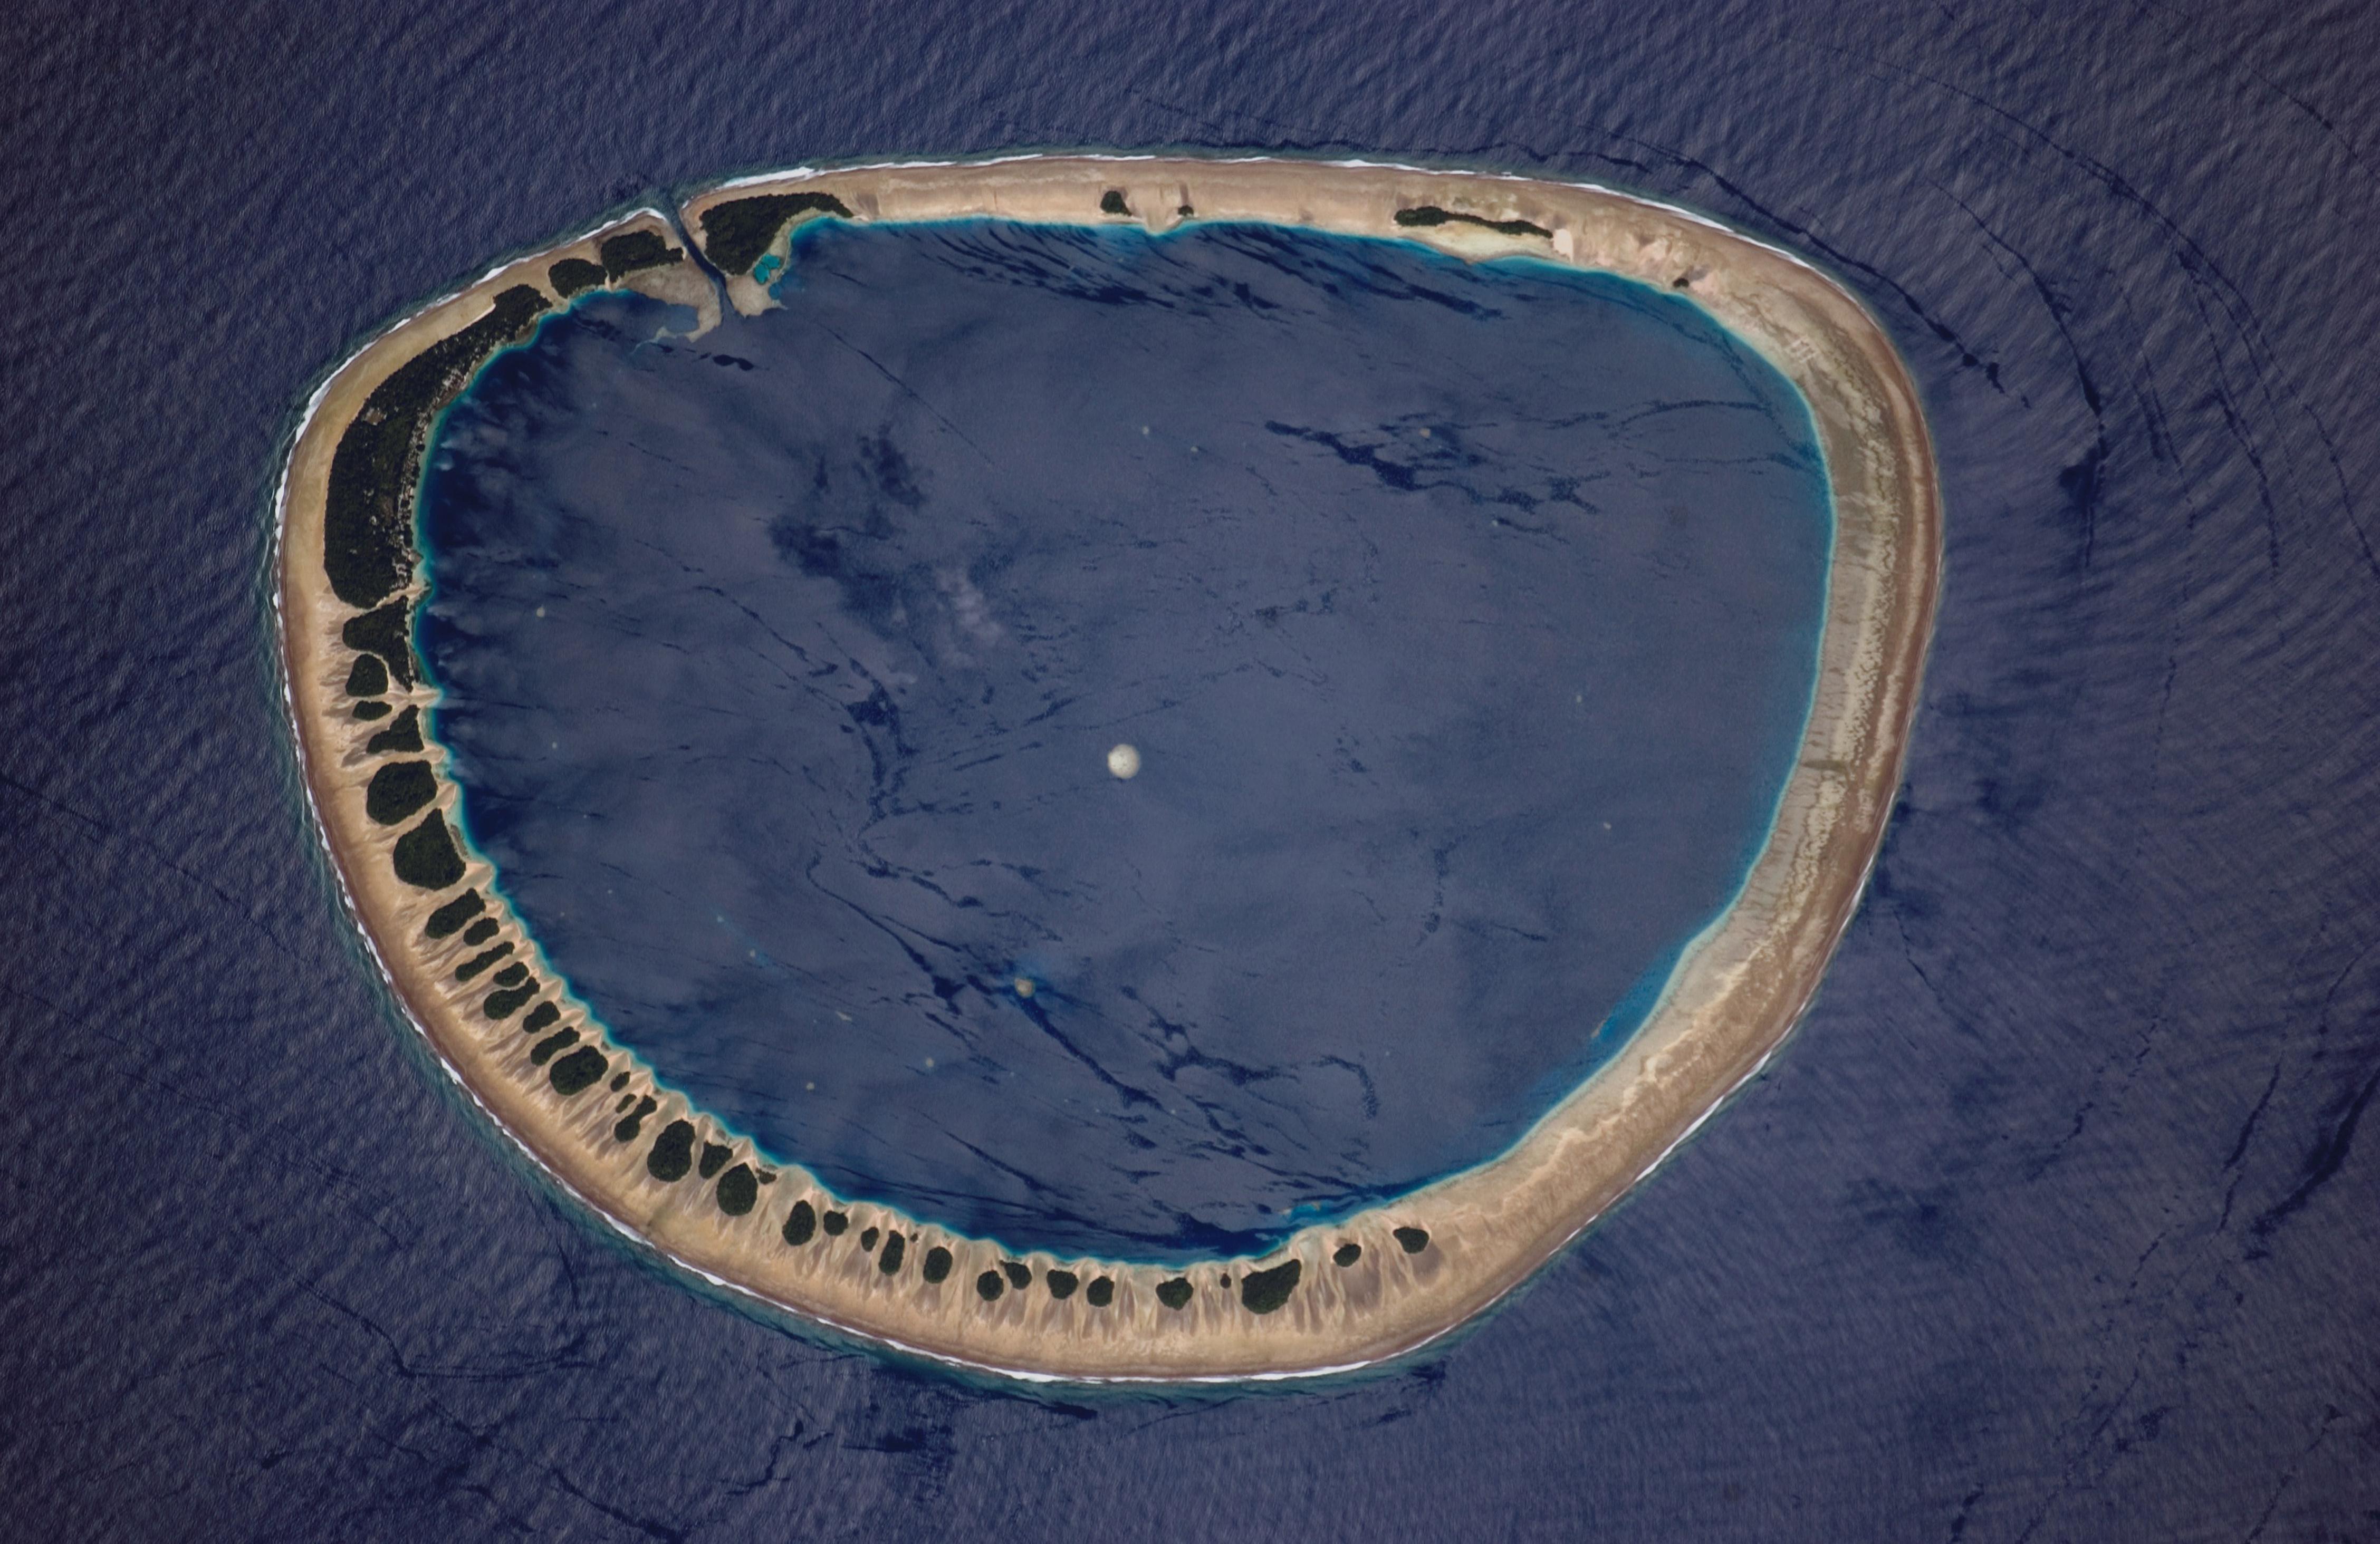 Photograph of Nukuoro Atoll, Federated States of Micronesia.